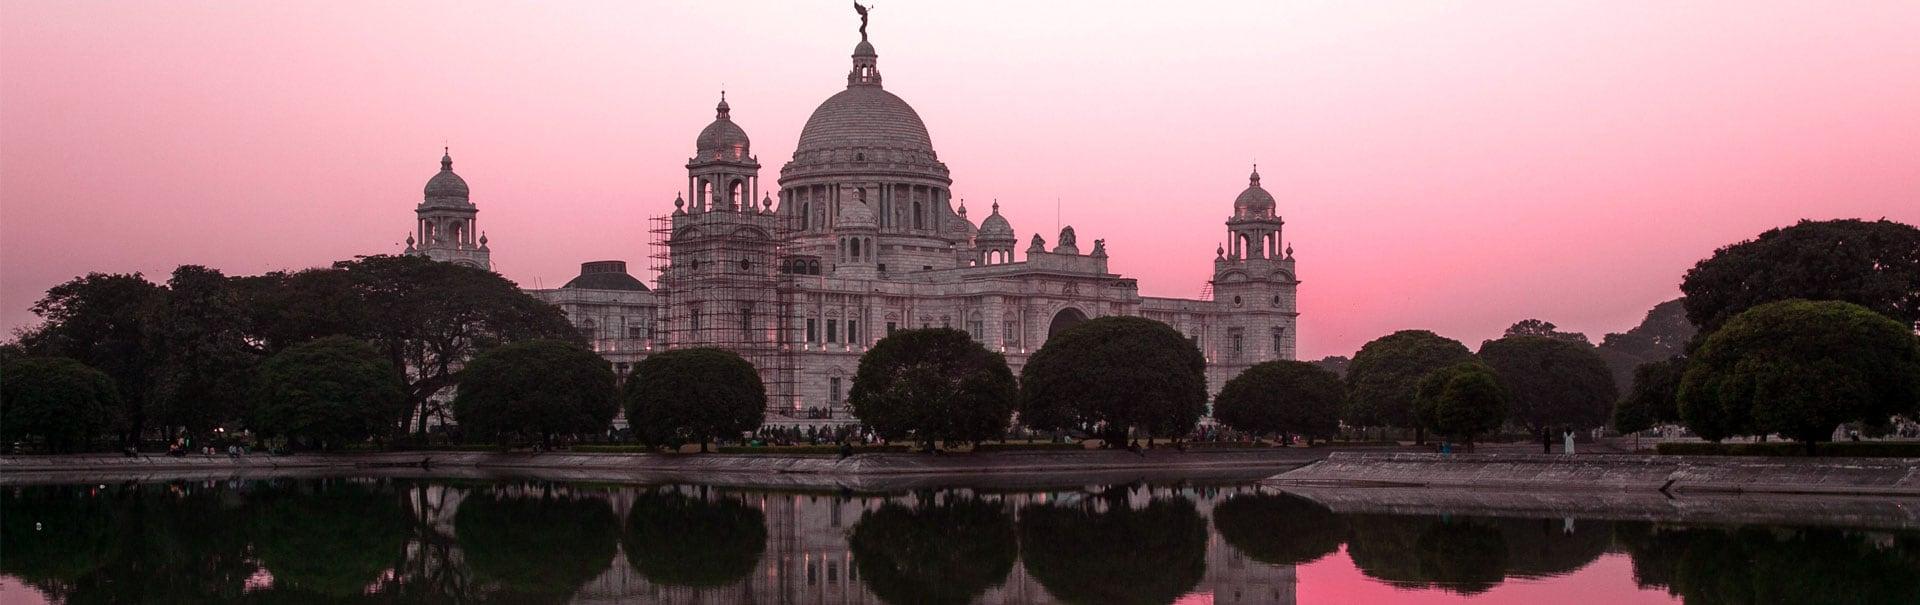 Kolkata Sunderban - IFly (STKS(I)) Banner